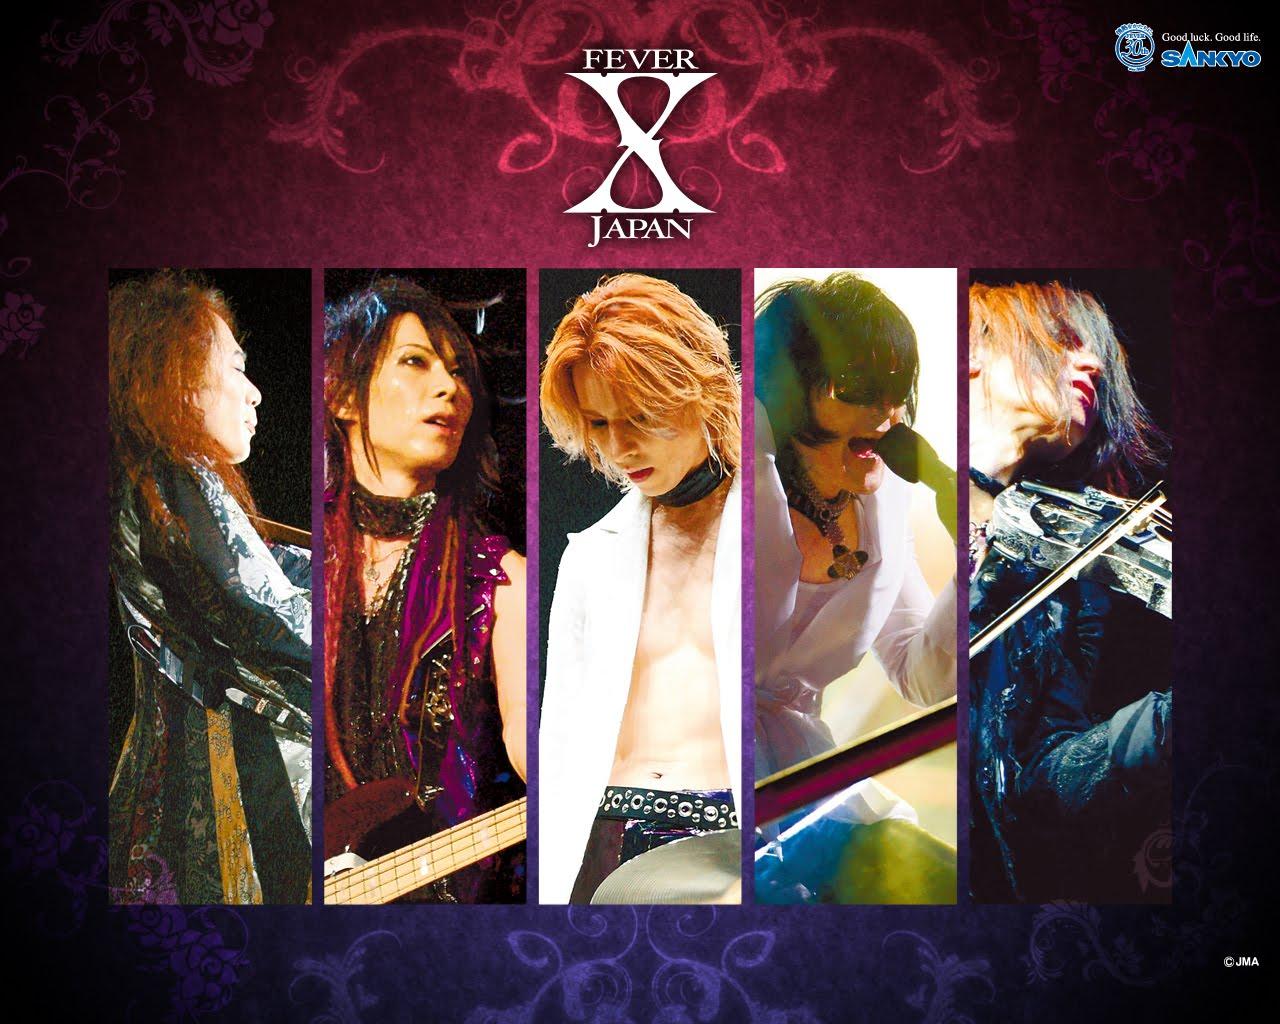 ASIA EN MEXICO: X JAPAN - Fotos página oficial World Tour 2010